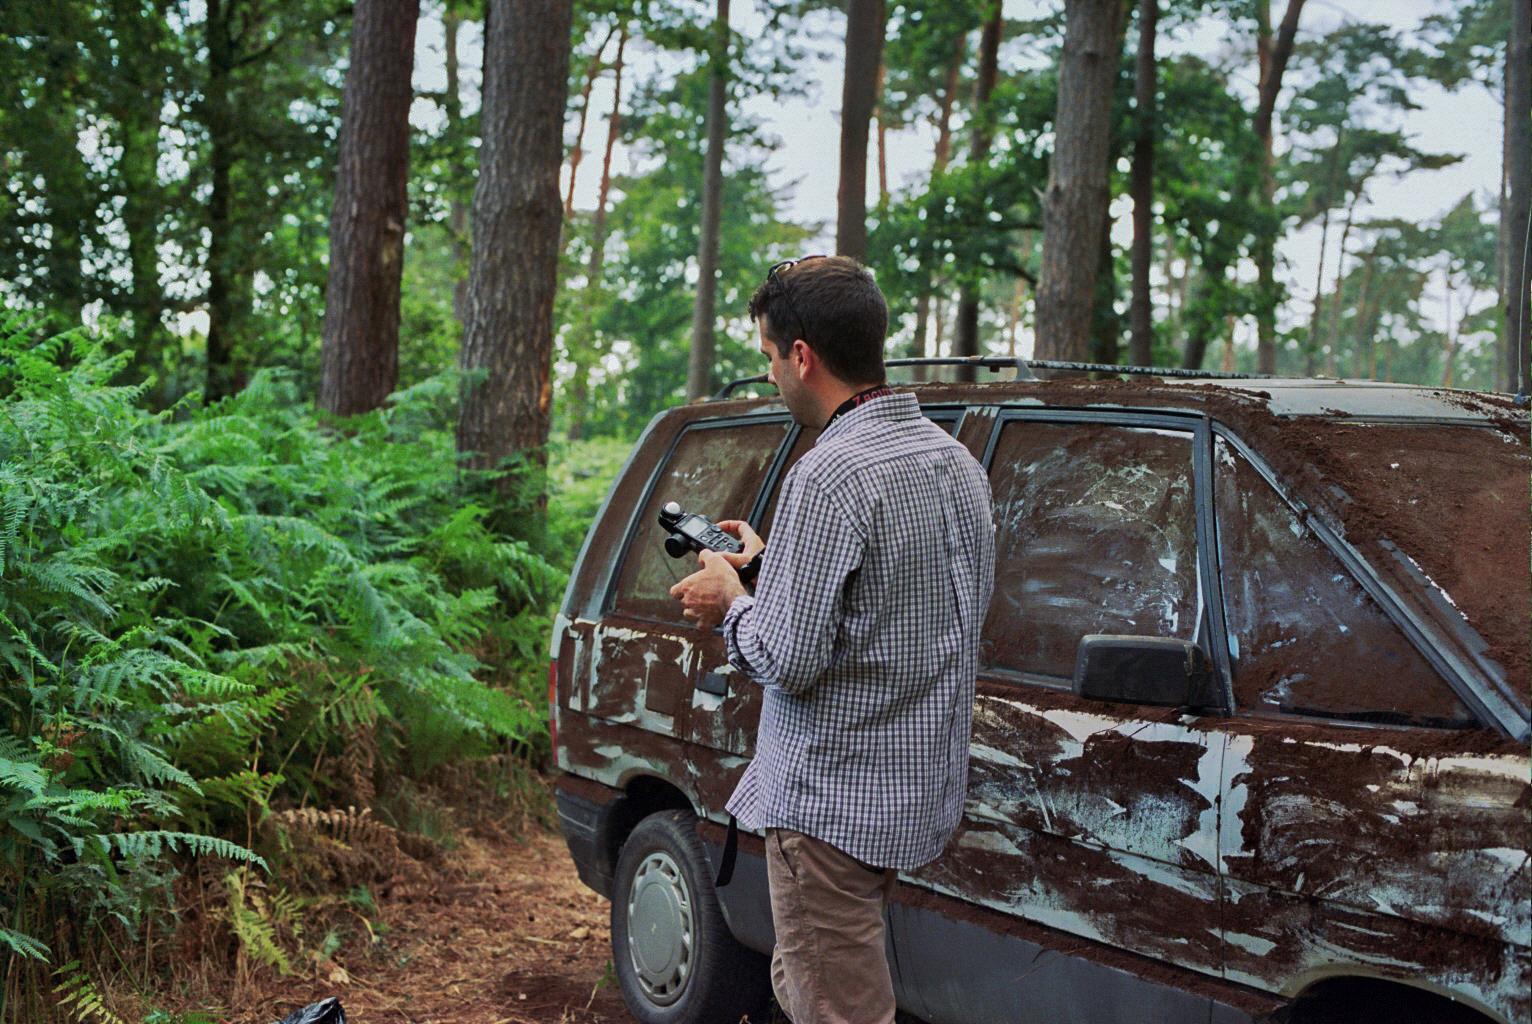 Ruines, tournage, Benoit Duvette